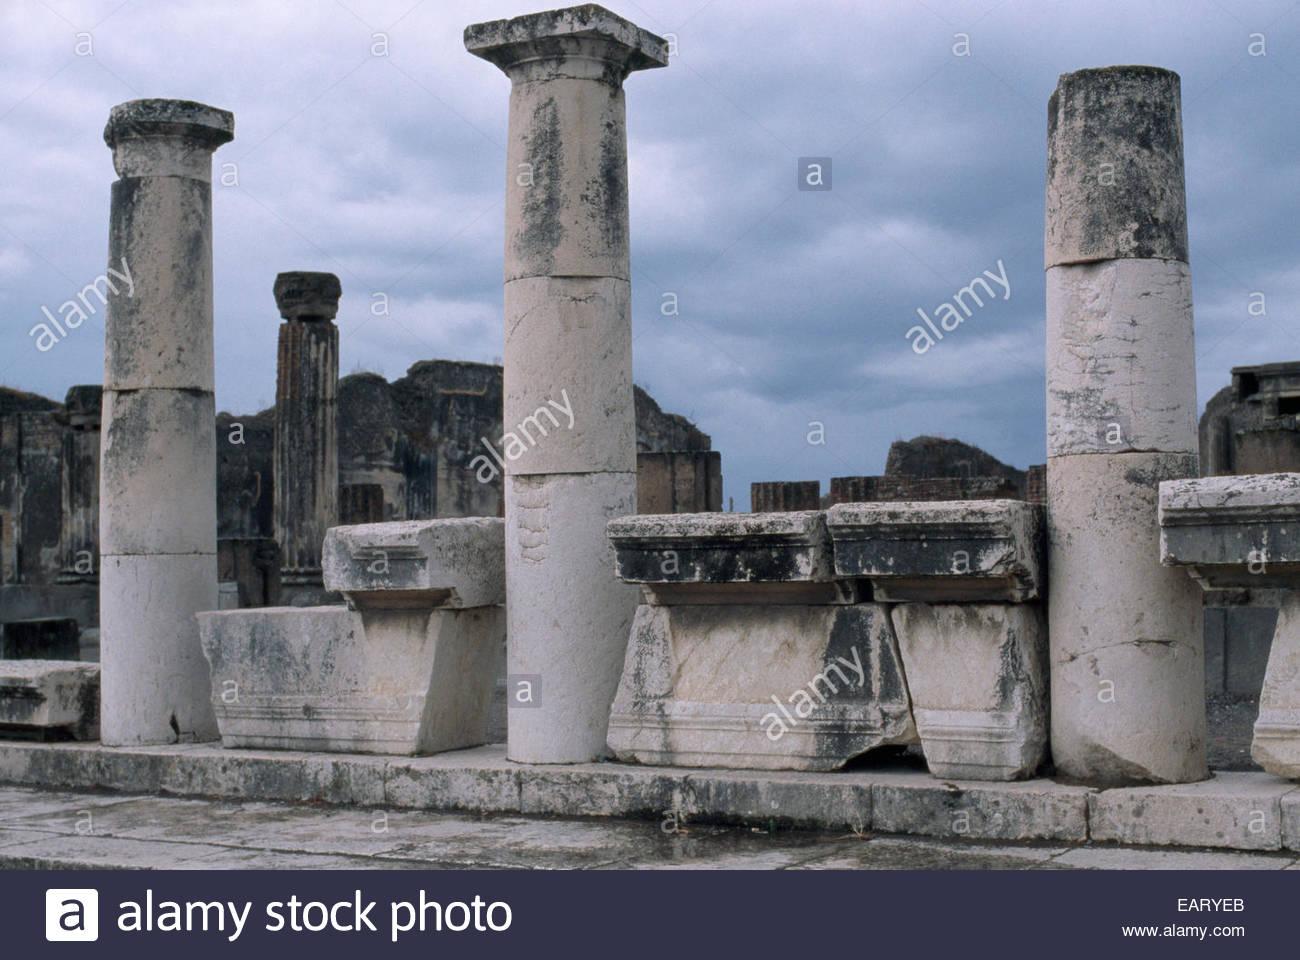 Part of the Villa dei Misteri, one of Pompeii's famous landmarks. - Stock Image